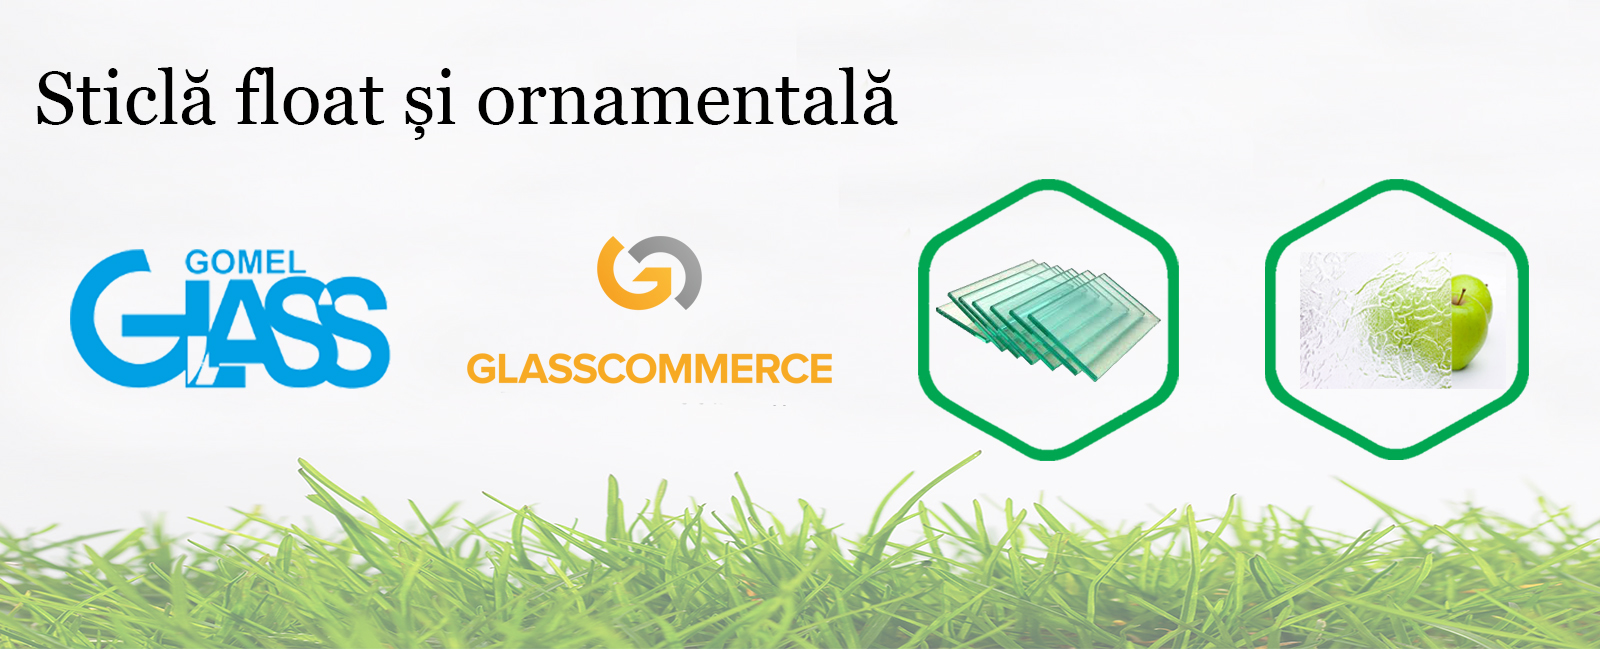 Sticla, float, ornamentala, ferastra, ferestre, termopan, pvc, geam, geamuri, sticlarie, sticlarit, low e